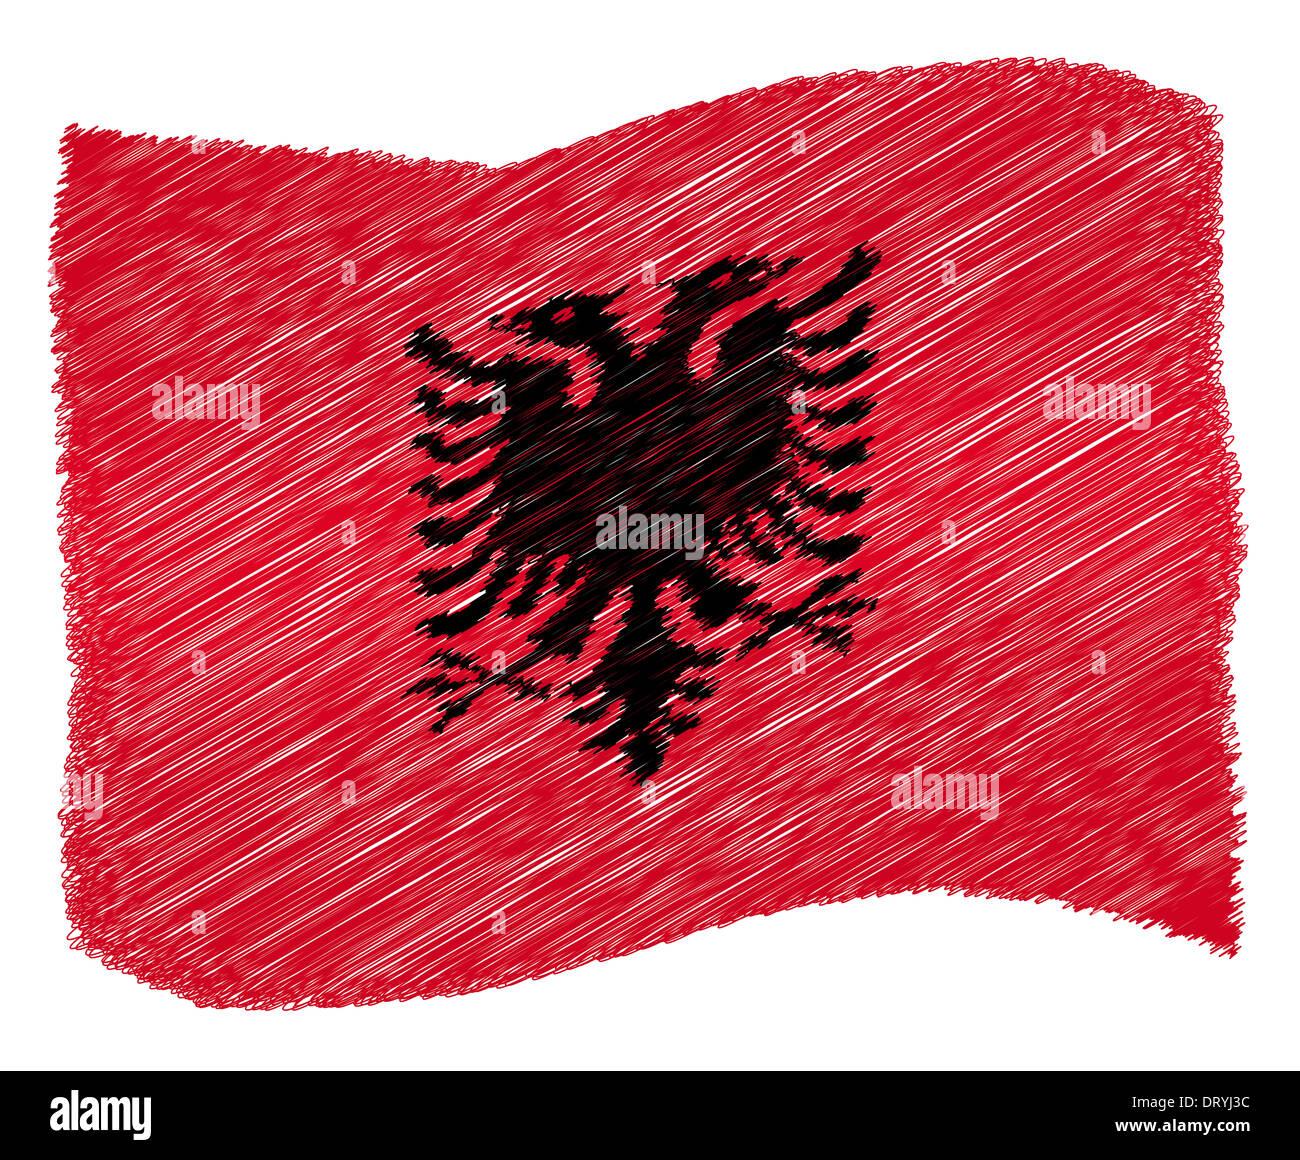 Sketch - Albania - Stock Image